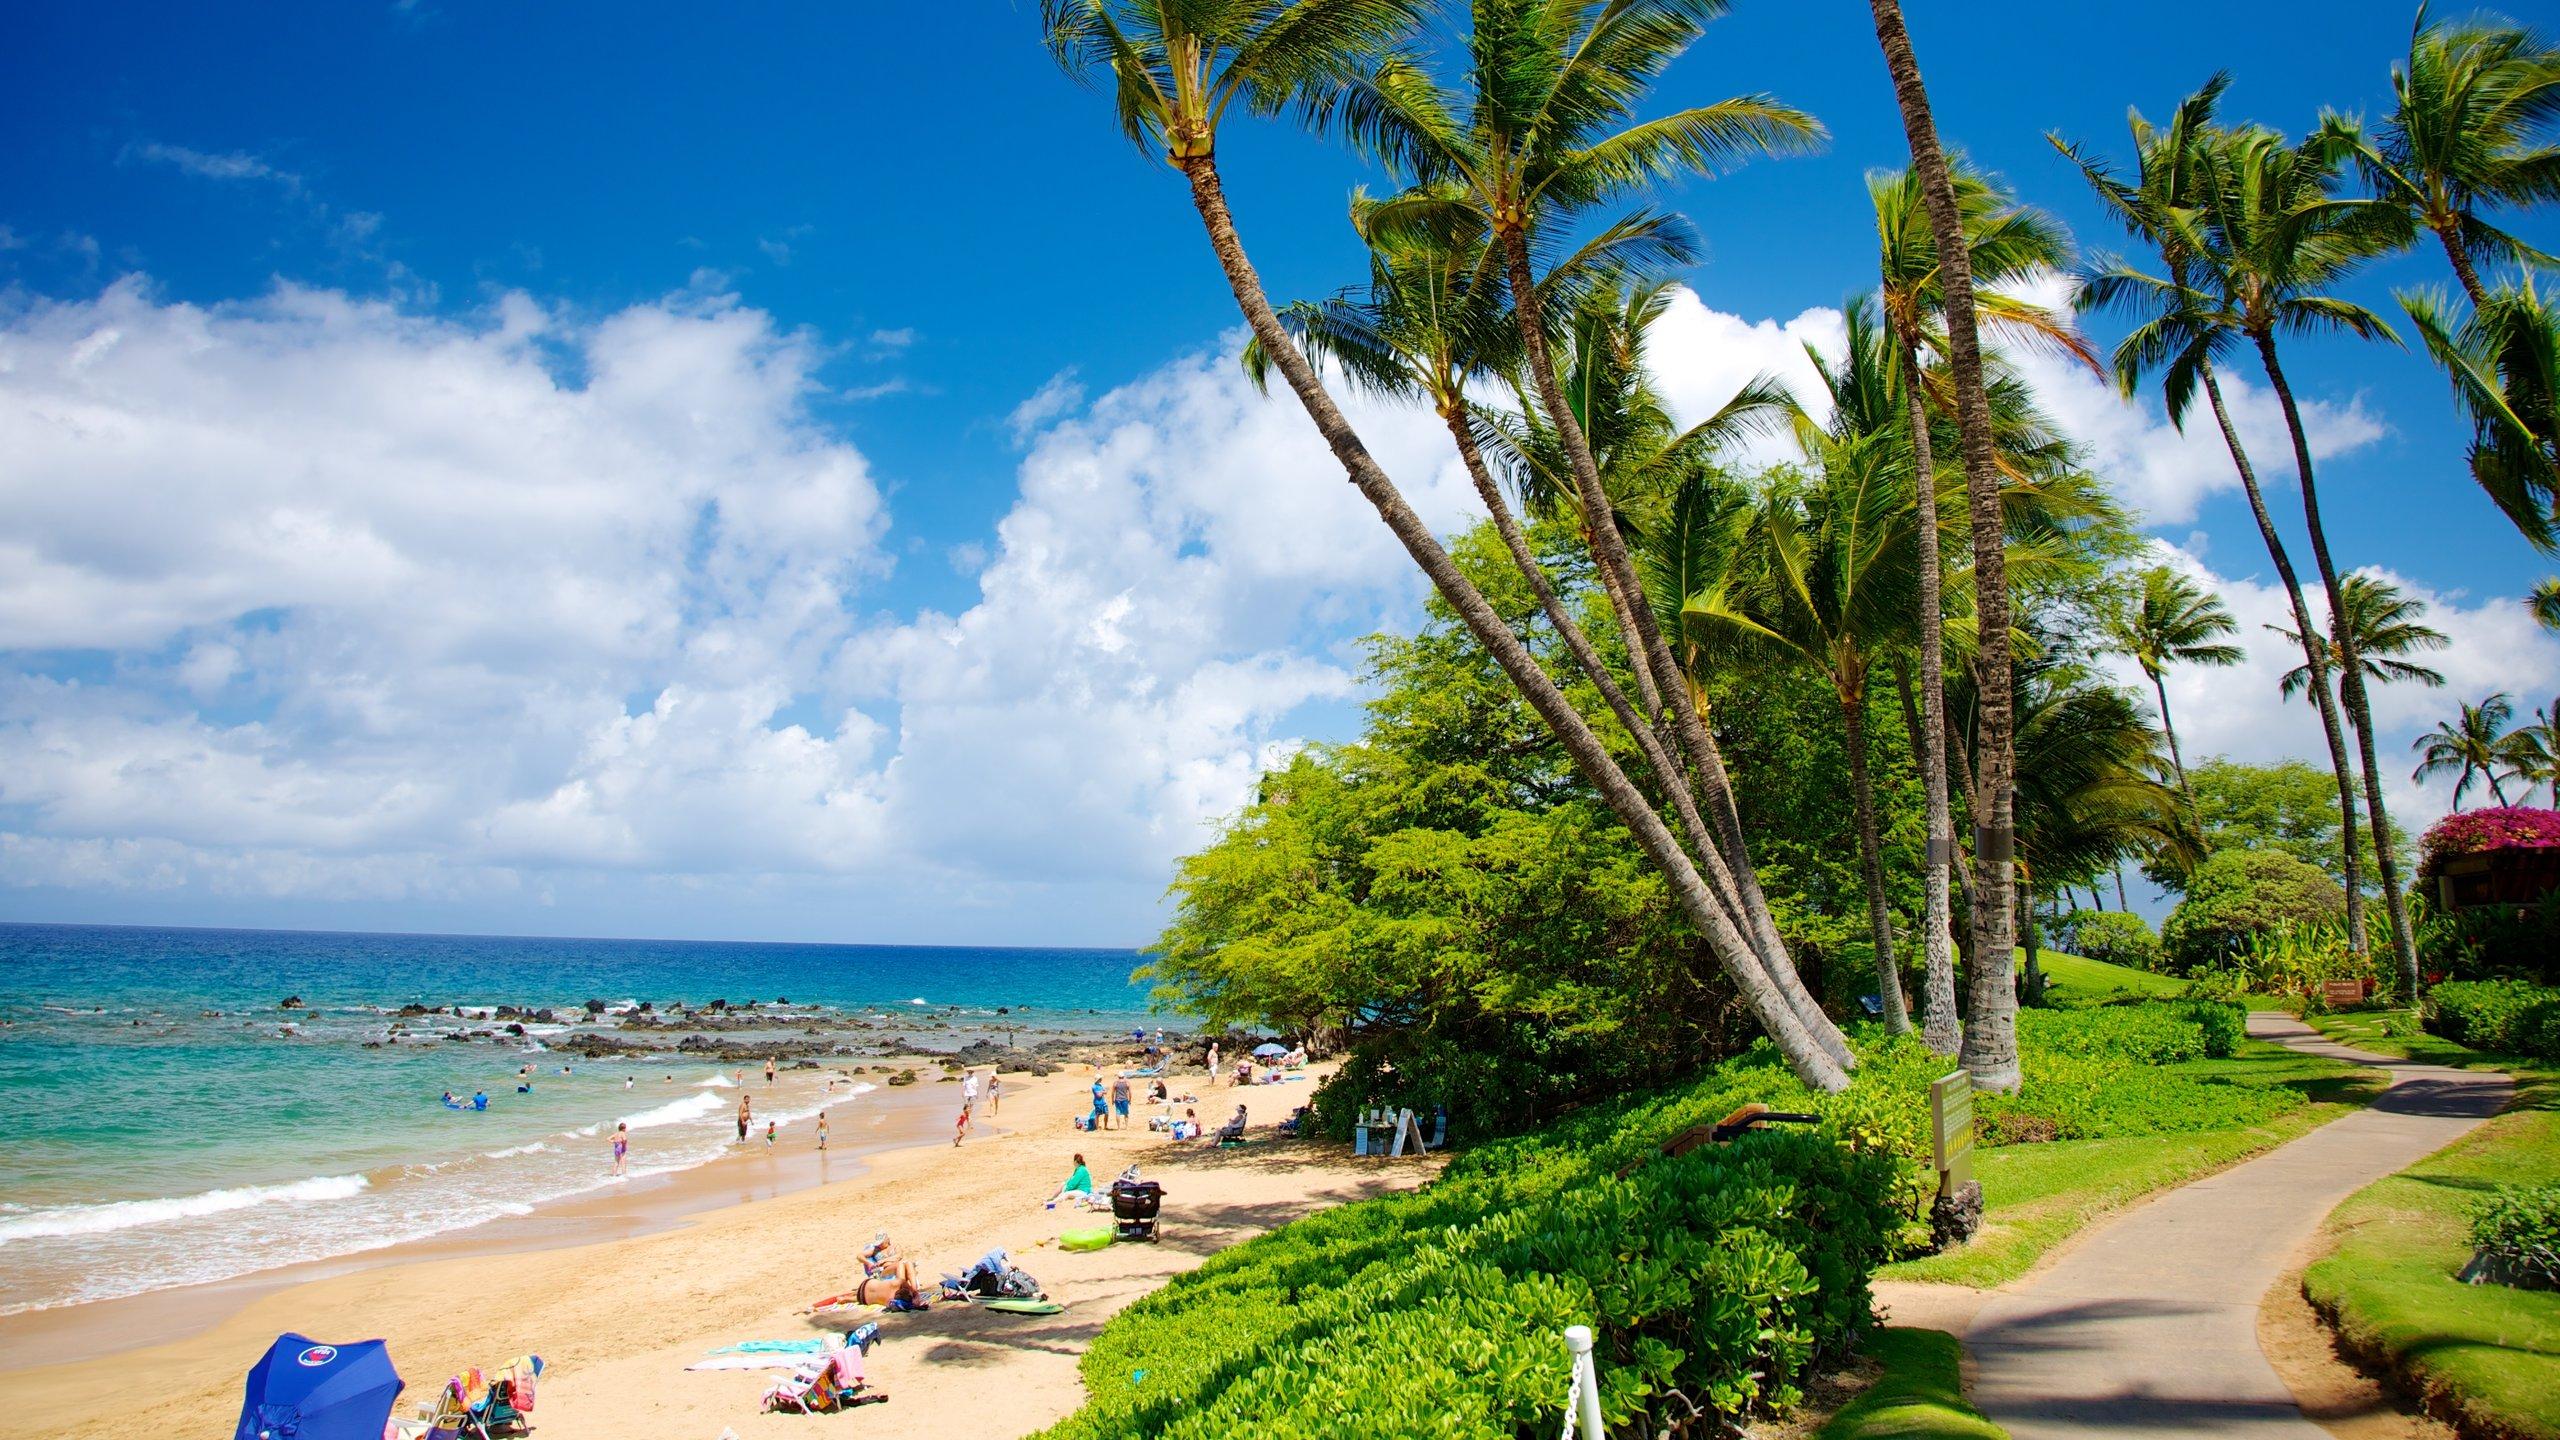 Wailea Beach, Kihei, Hawaii, United States of America